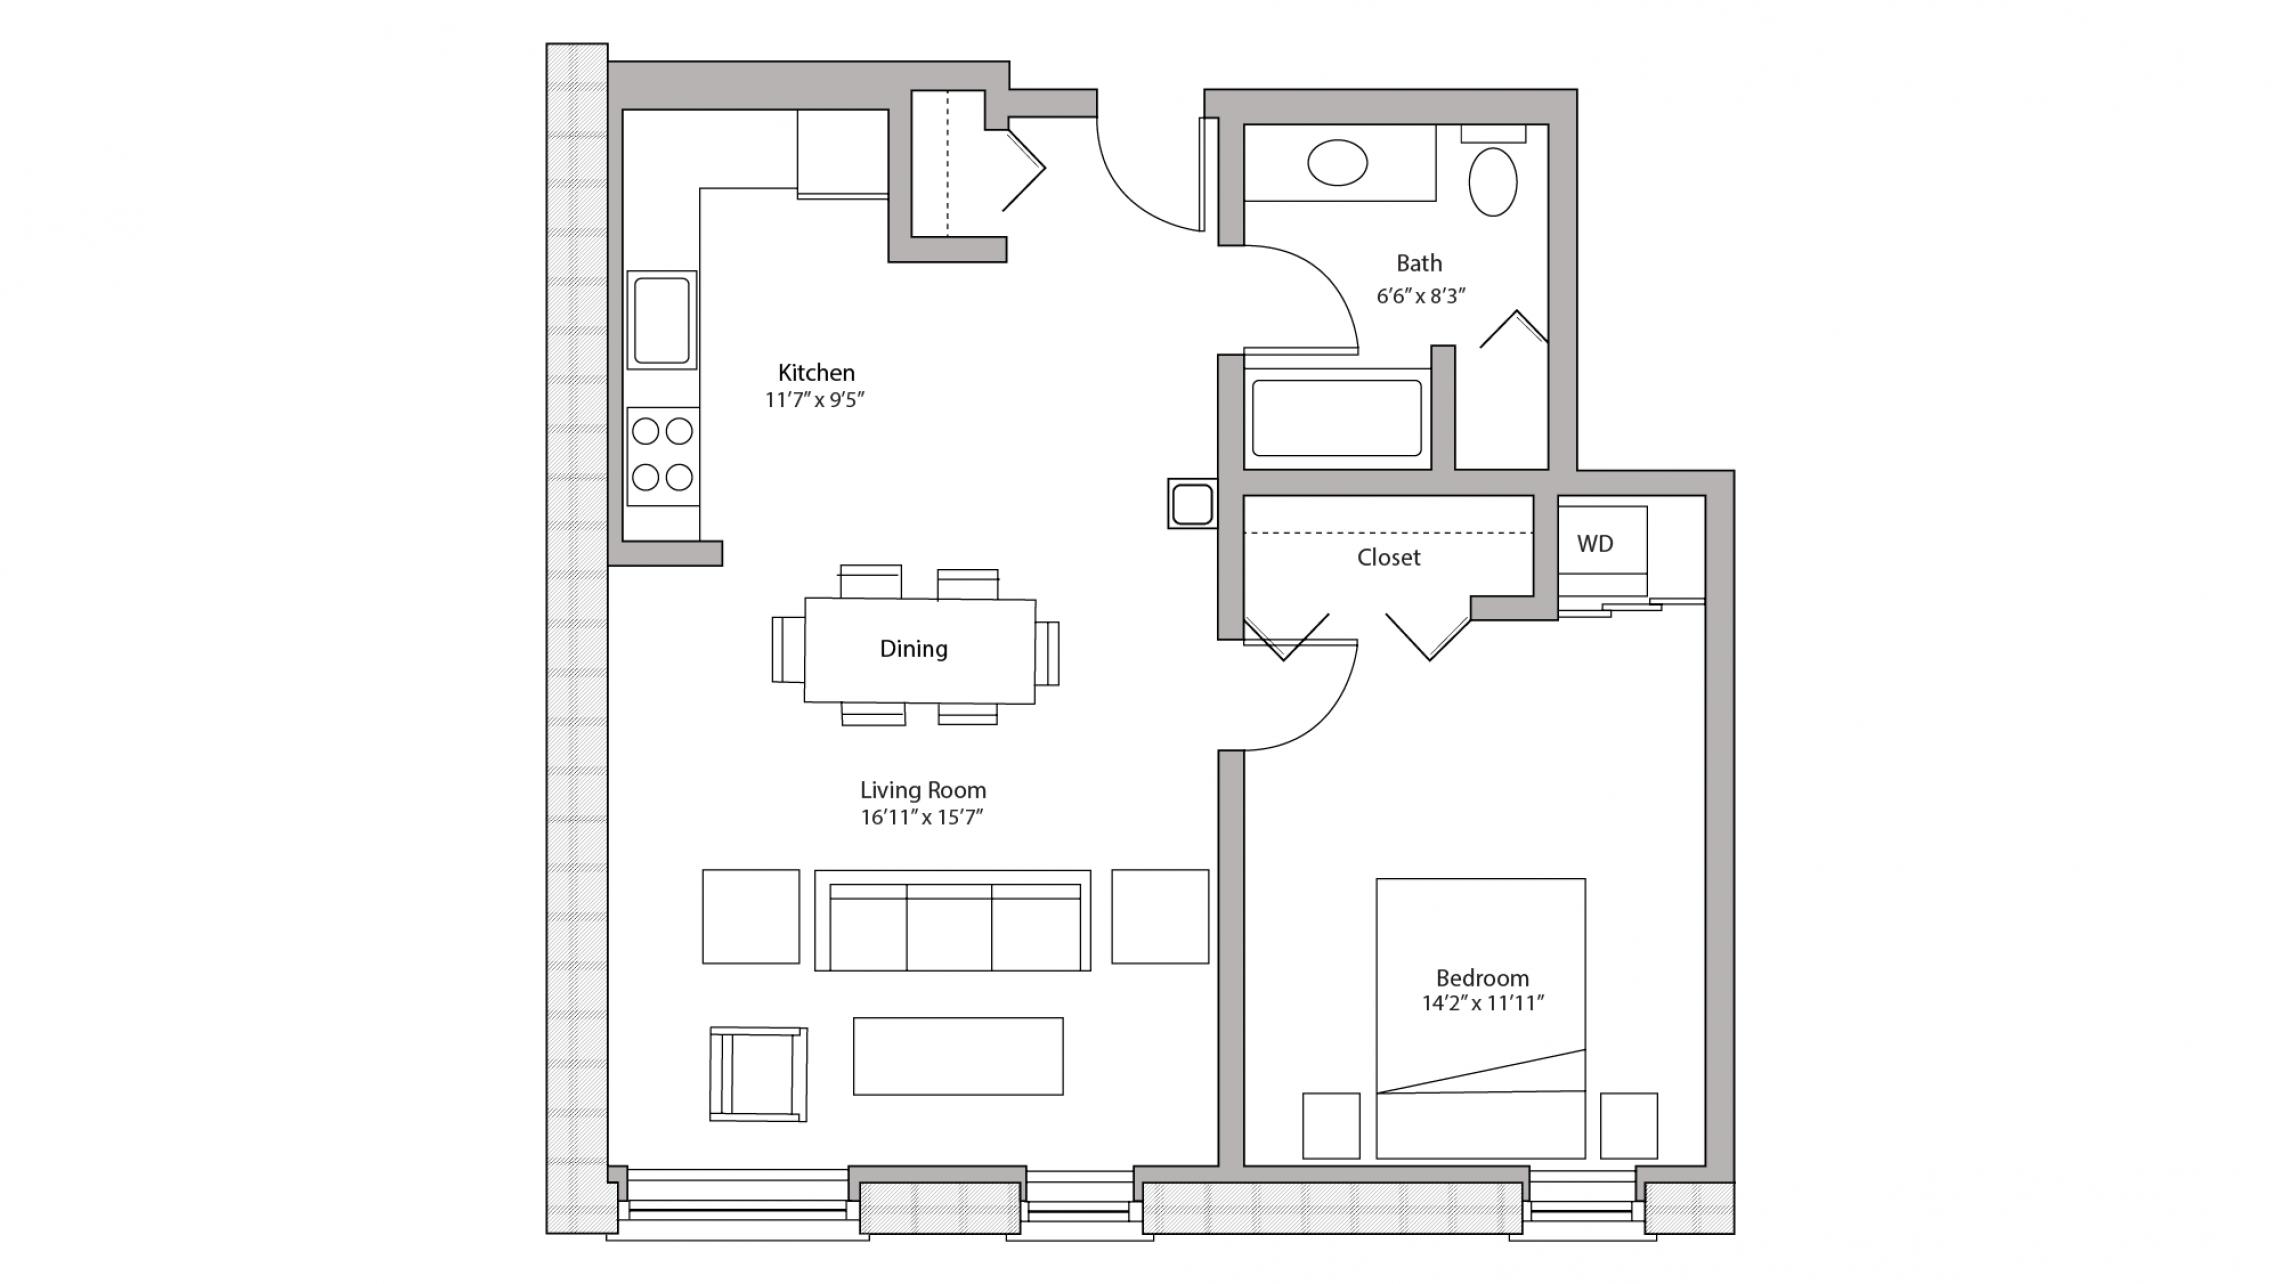 ULI Tobacco Lofts W216 - One Bedroom, One Bathroom